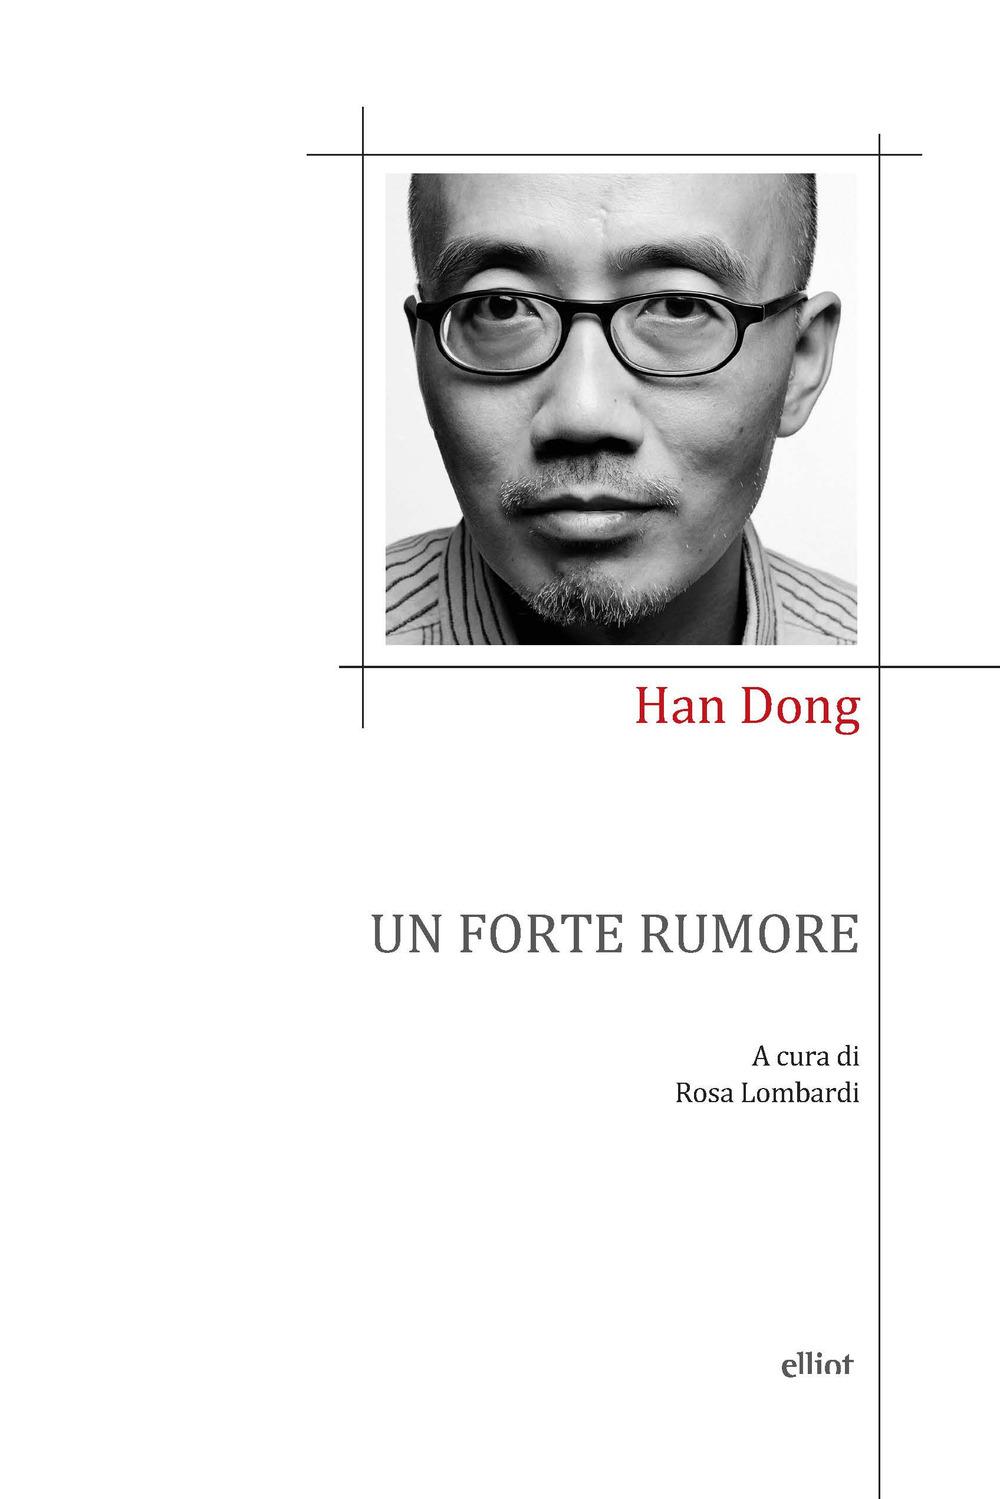 FORTE RUMORE. POESIE 1982-2014 (UN) - Han Dong - 9788869939815